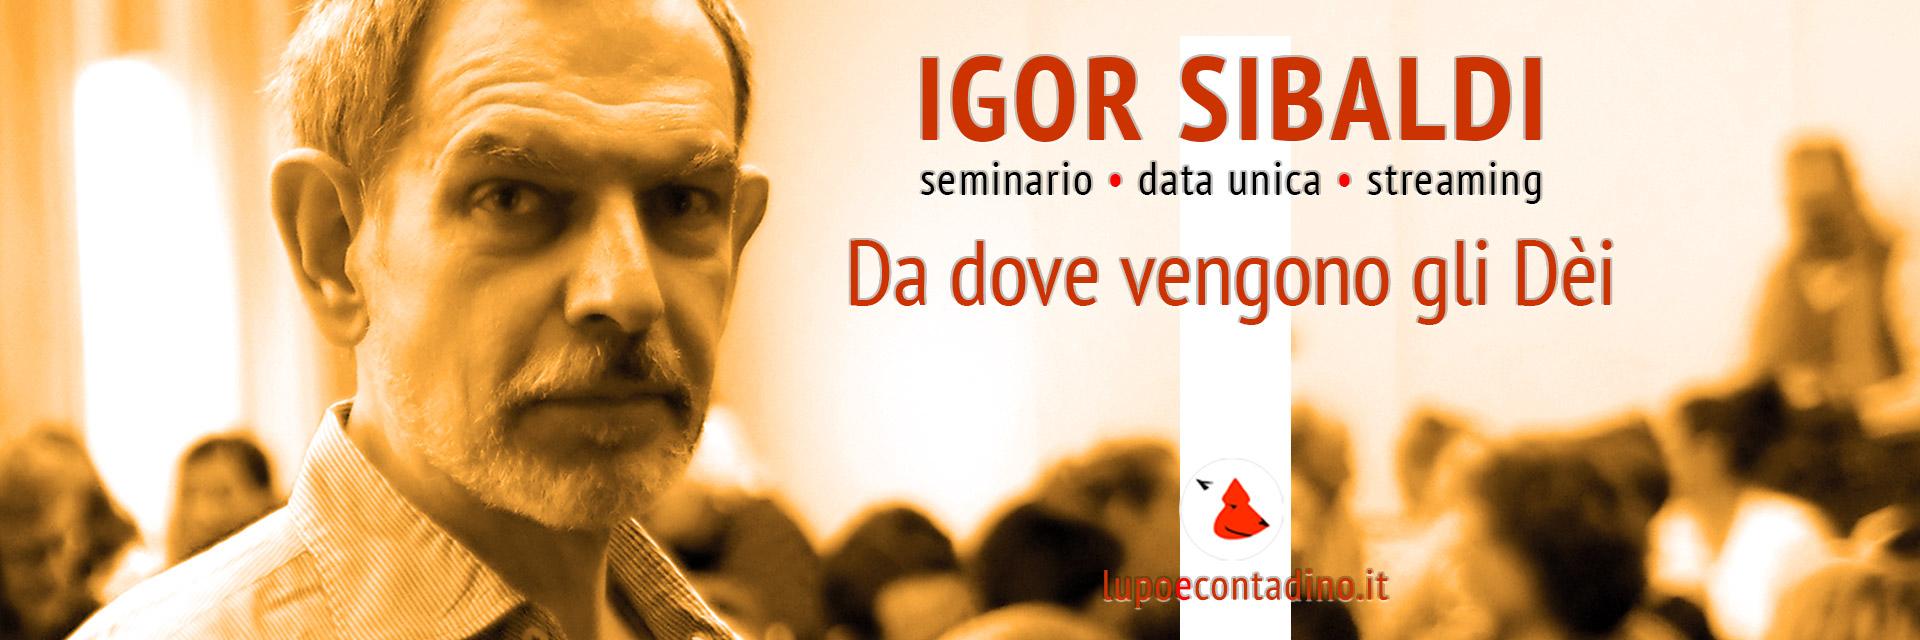 Igor Sibaldi - Seminario 27 settembre